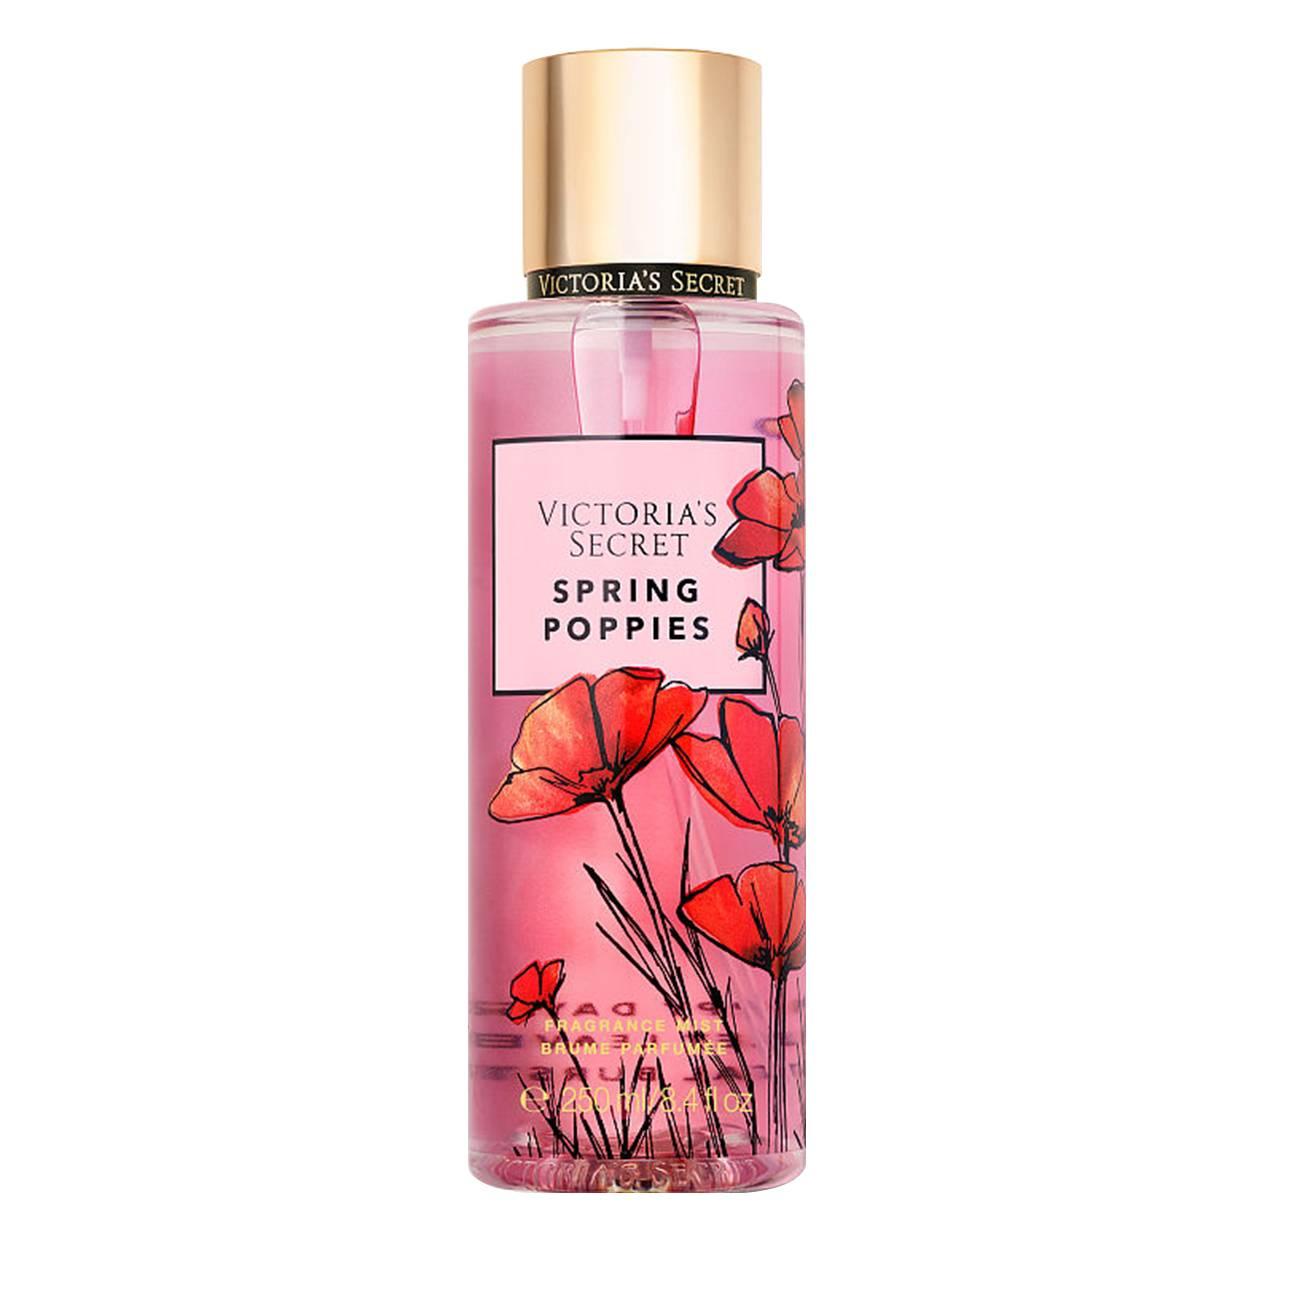 Spring Poppies Mist Victoria's Secret imagine 2021 bestvalue.eu